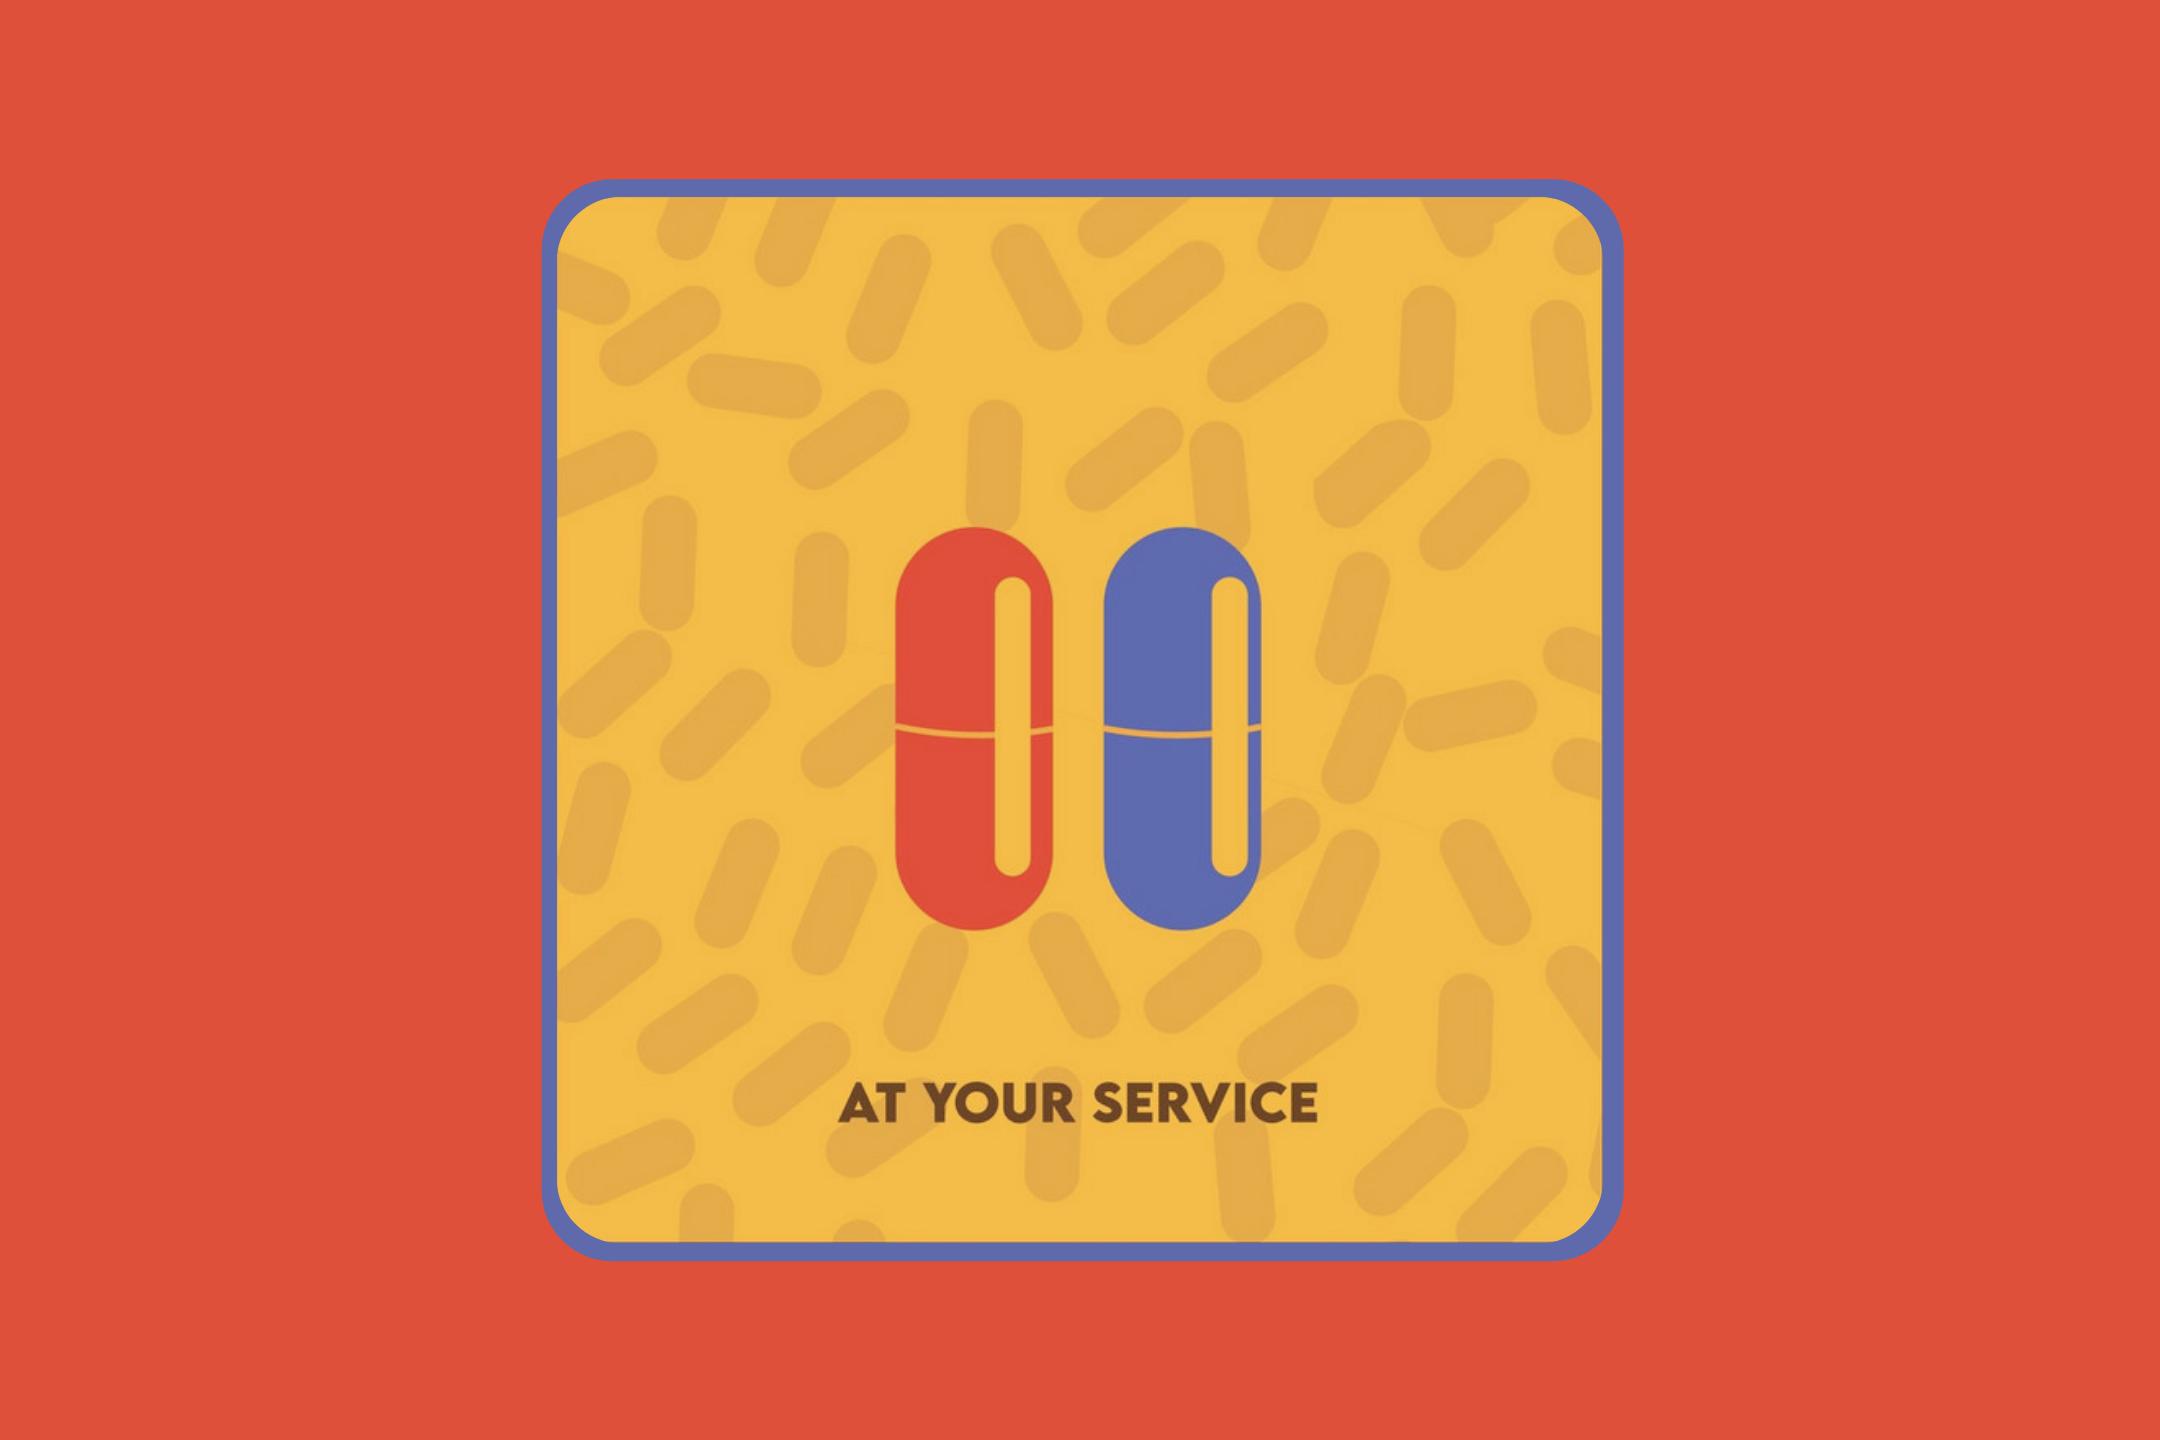 Moksh At Your Service